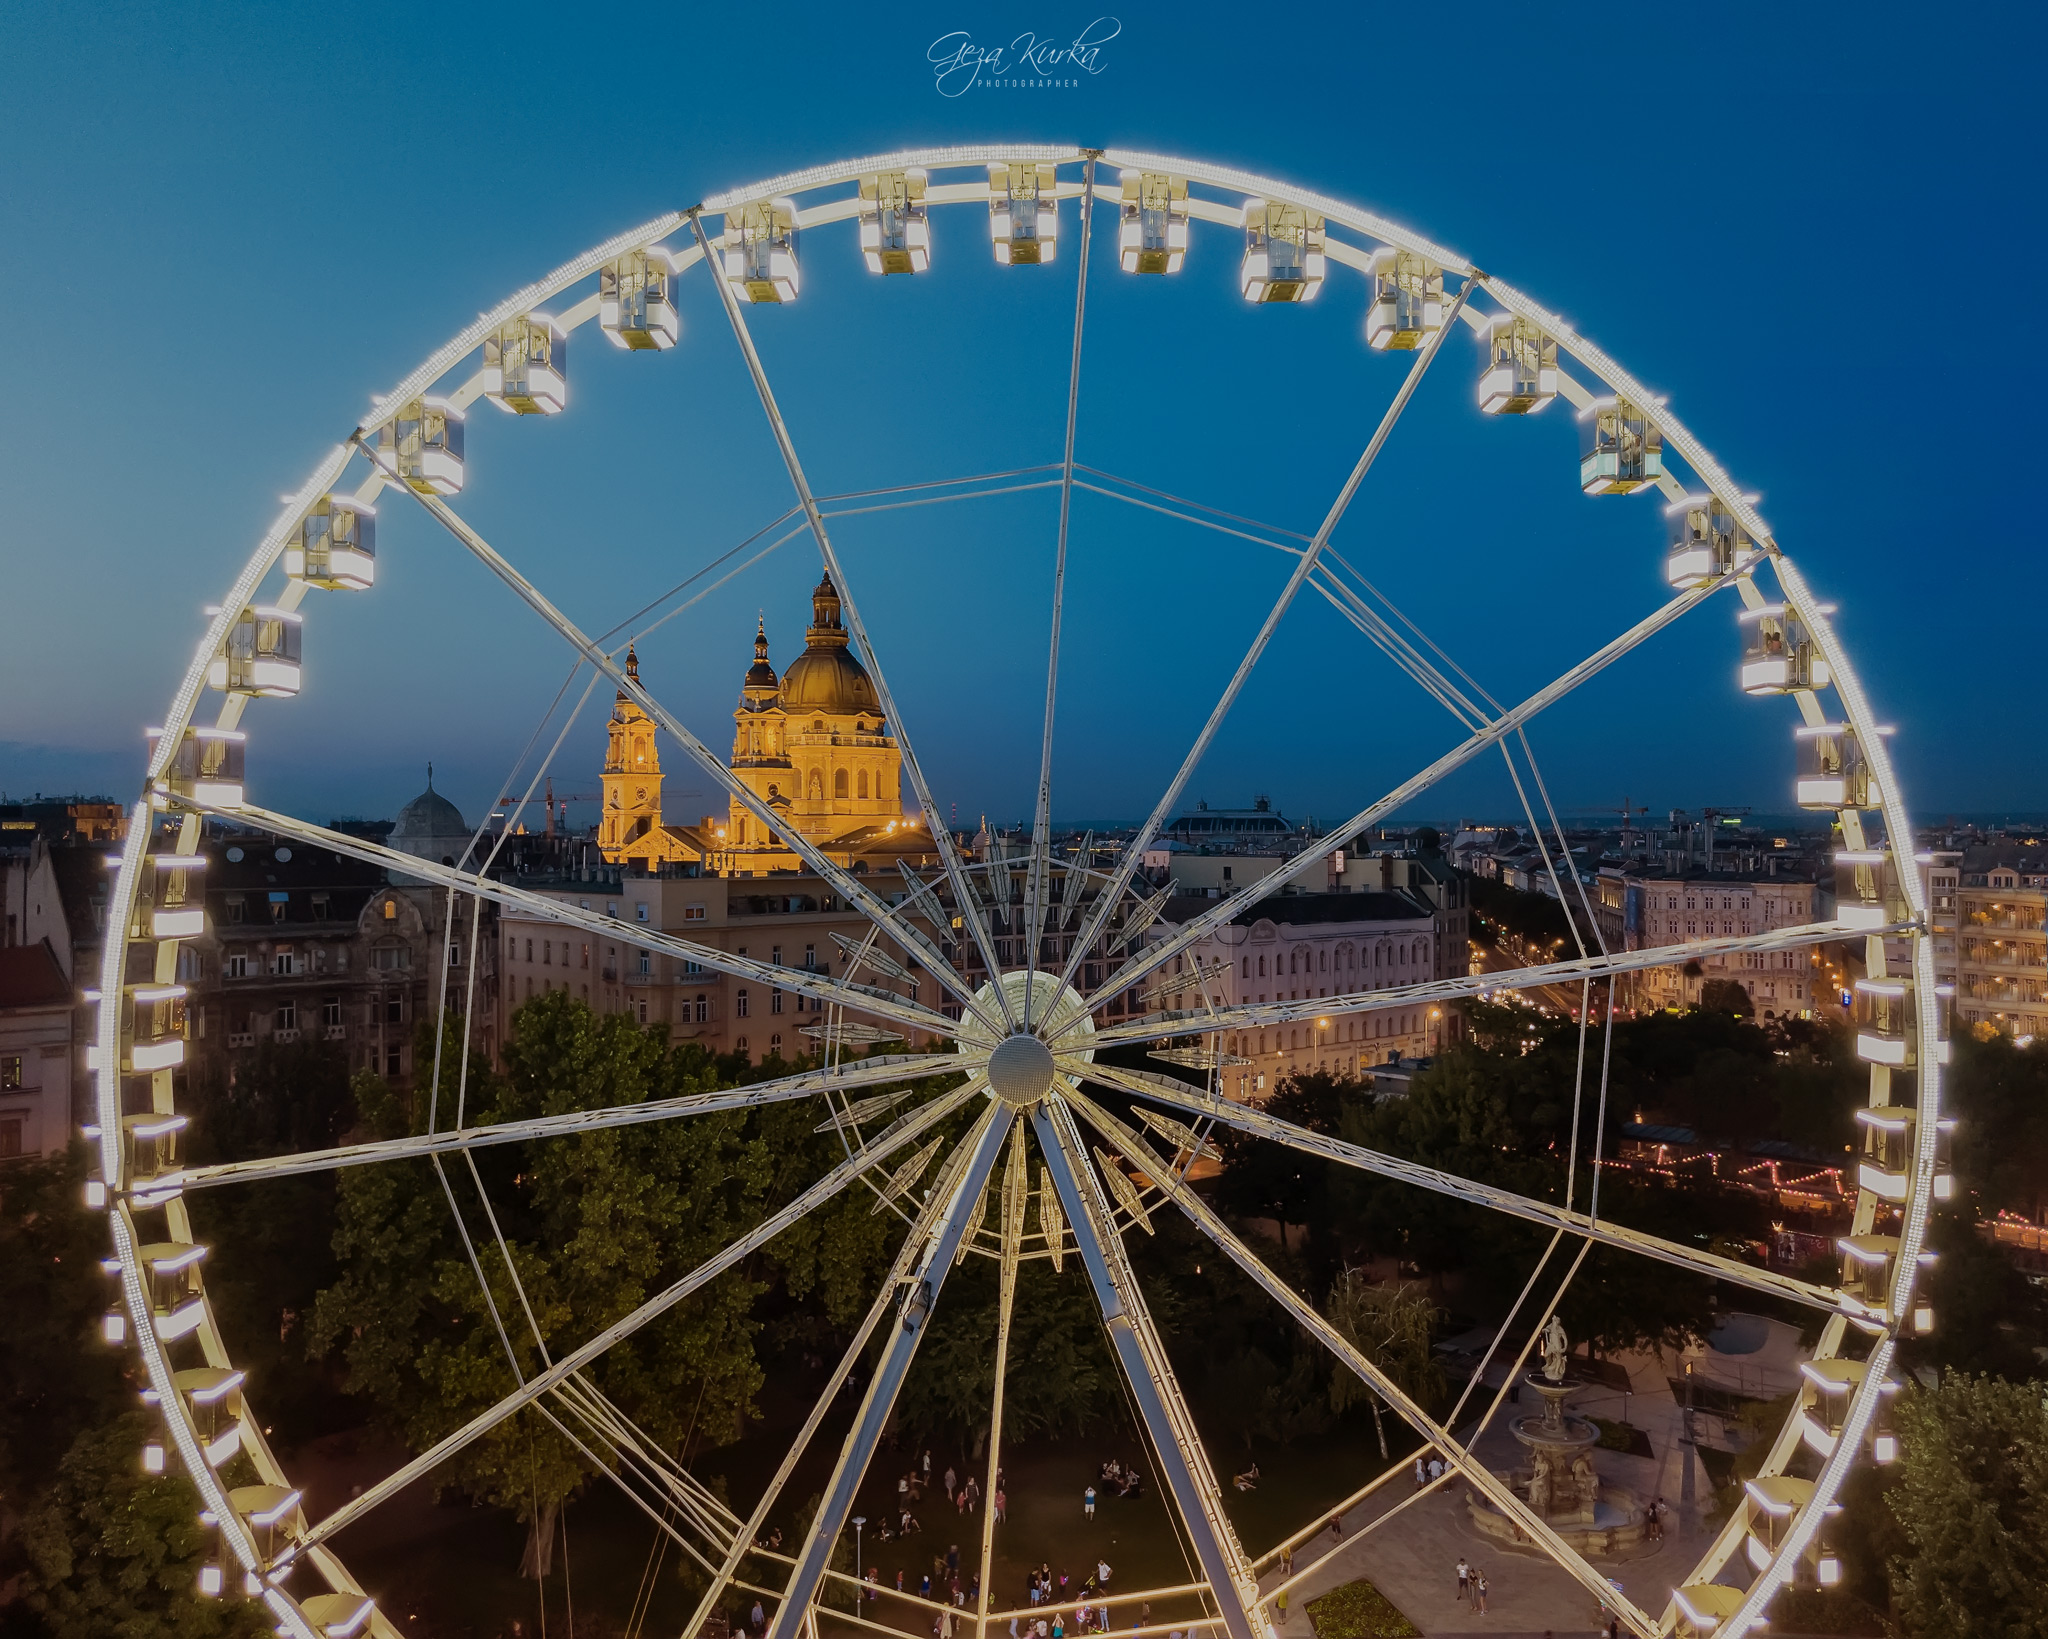 Budapest Eye Ferris wheel, Hungary